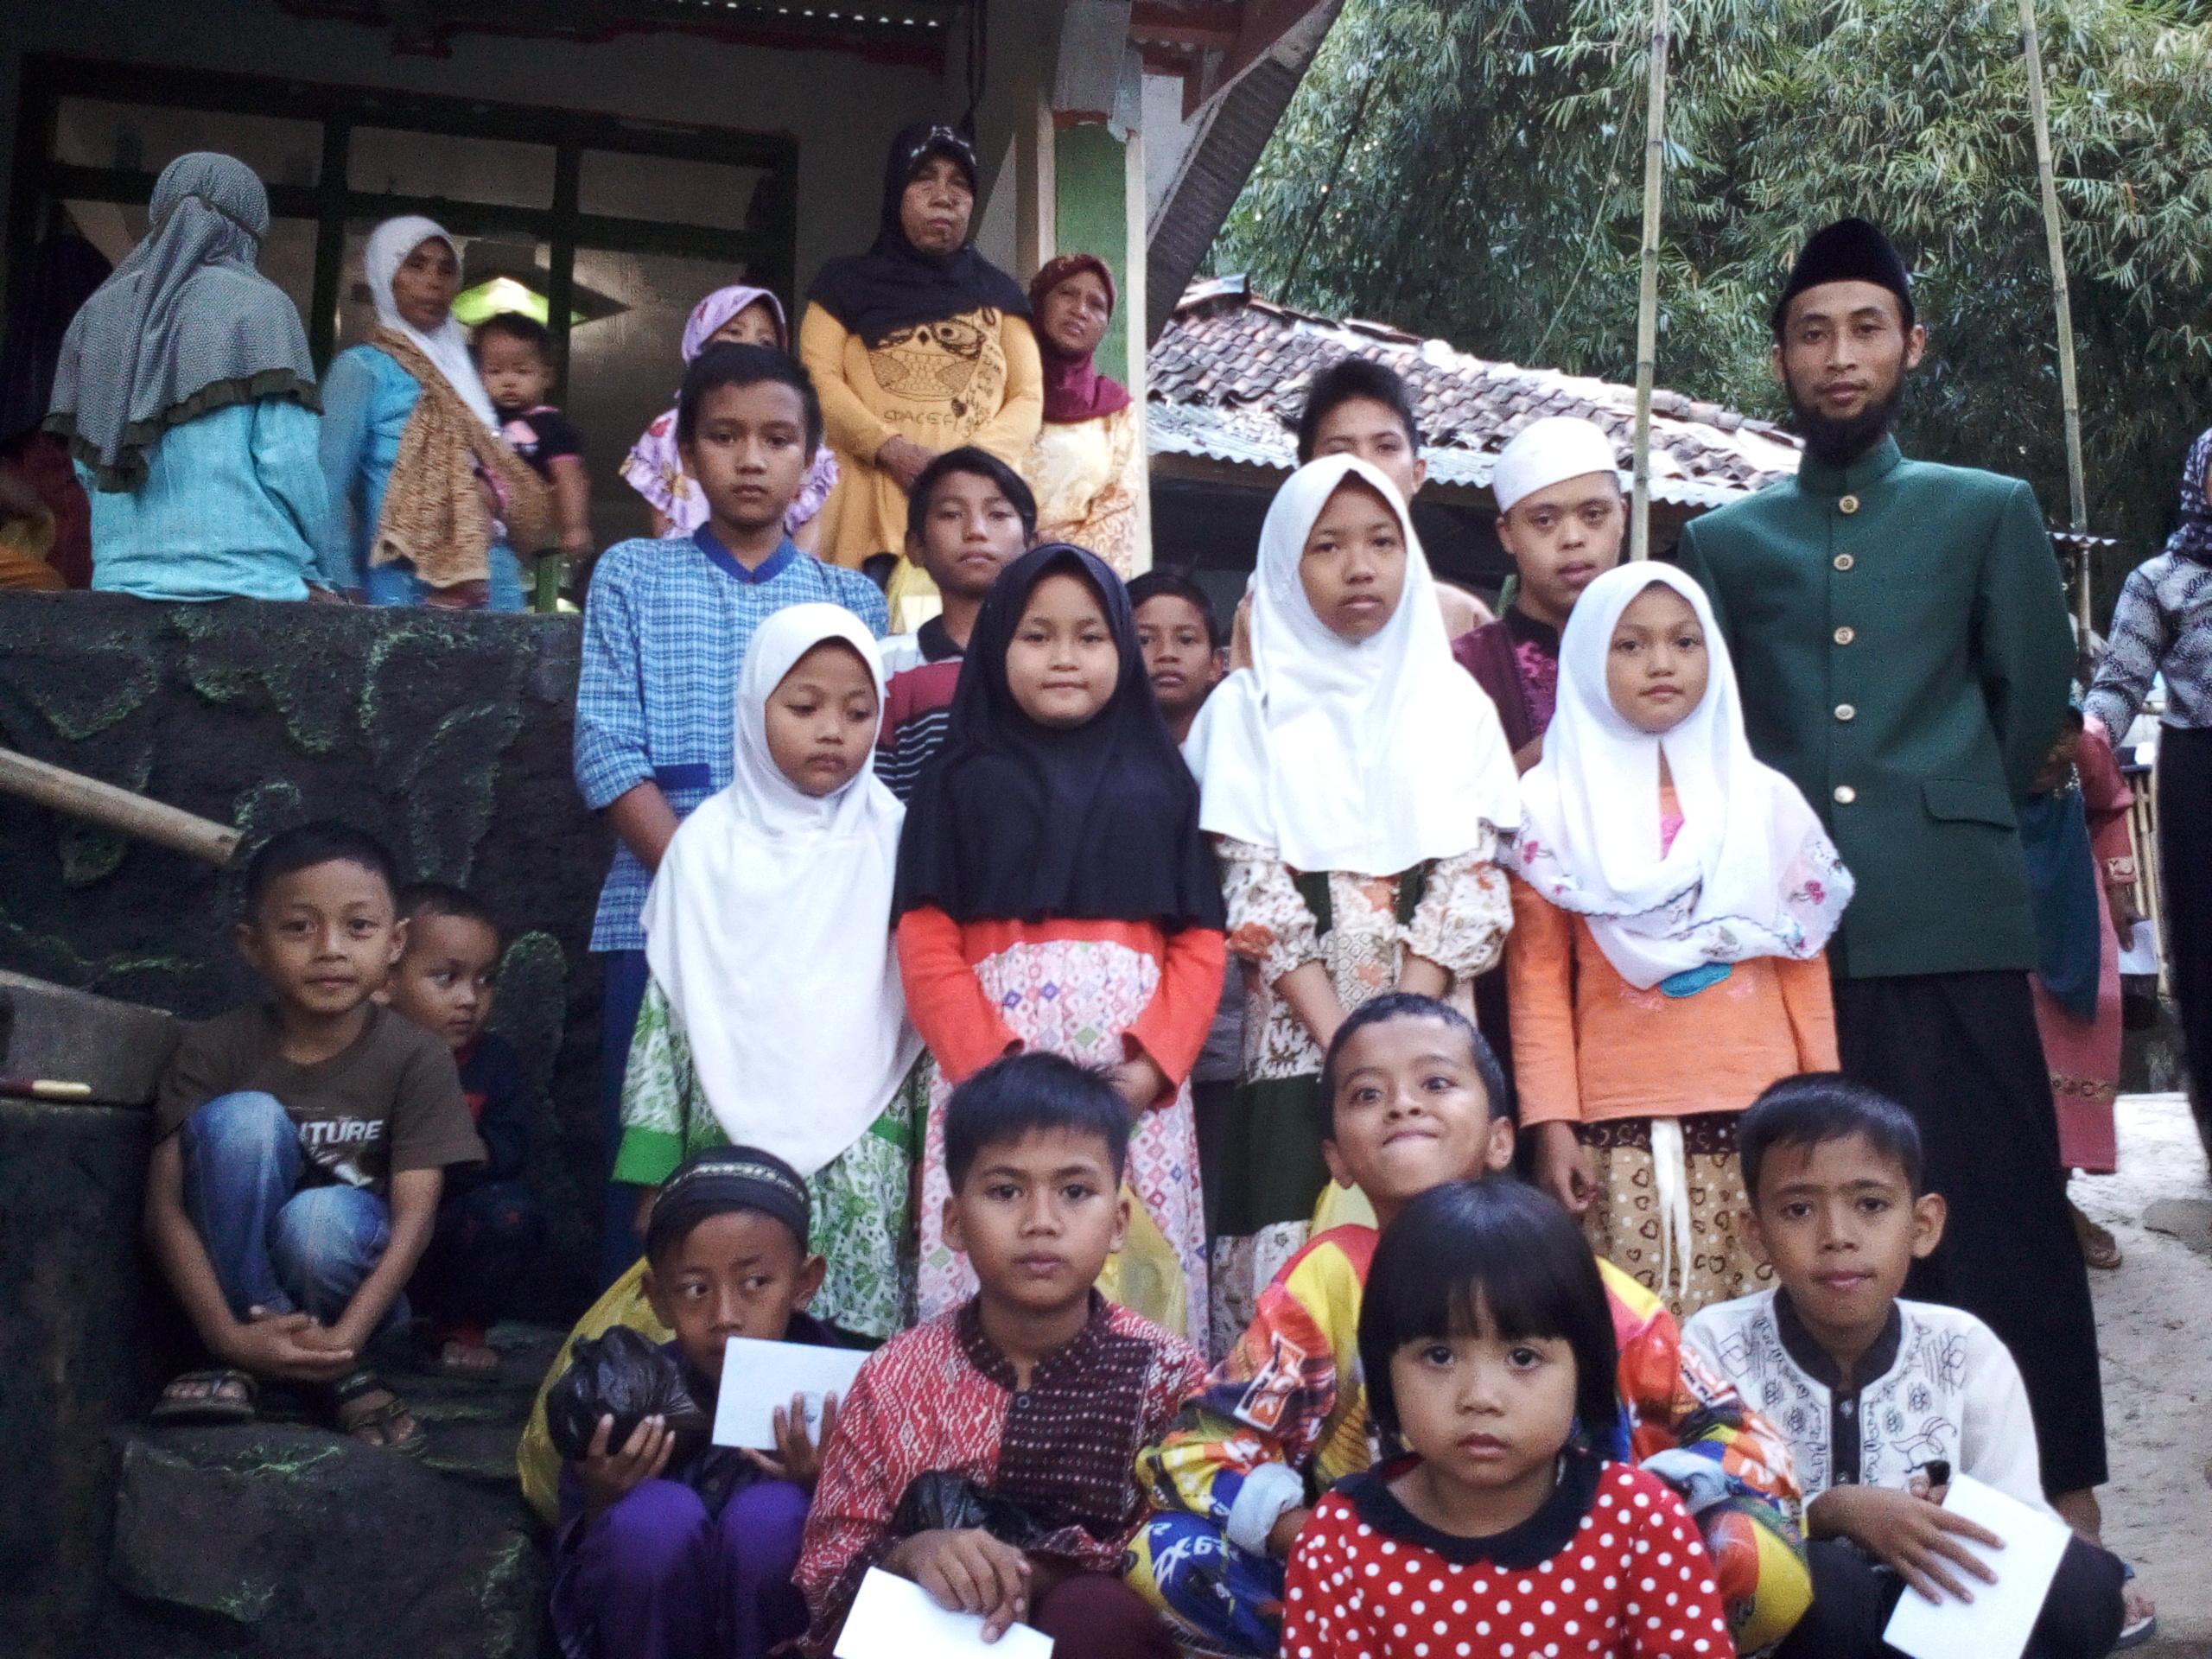 foto bersama Anak Yatim & Pengurus Yayasan wadhi barkah